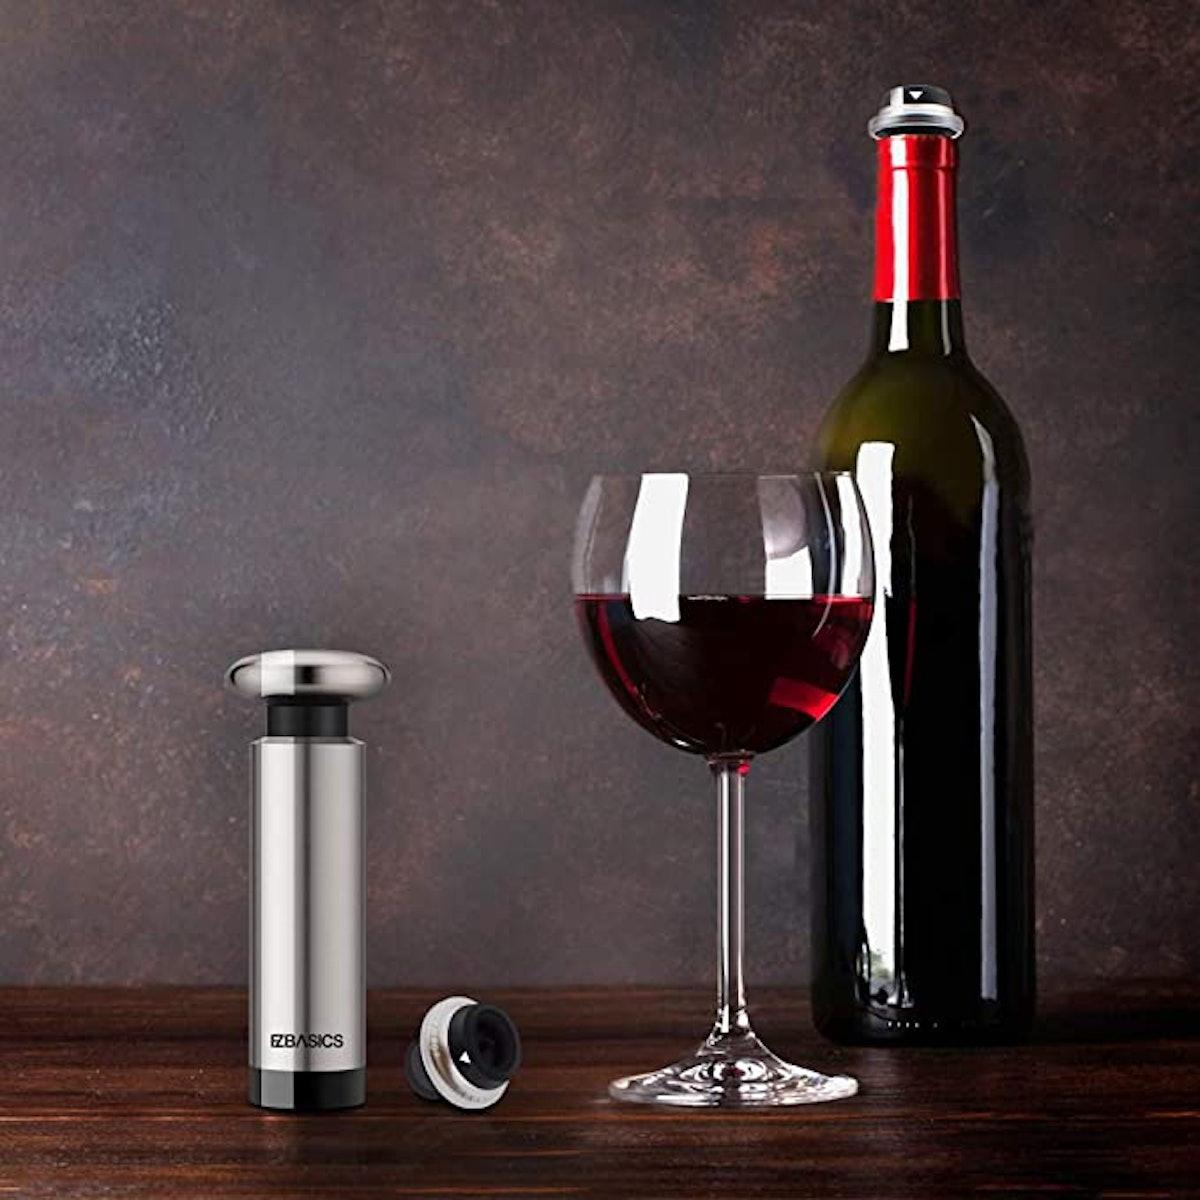 EZBASICS Wine Saver Vacuum Pump with 2 Wine Stoppers